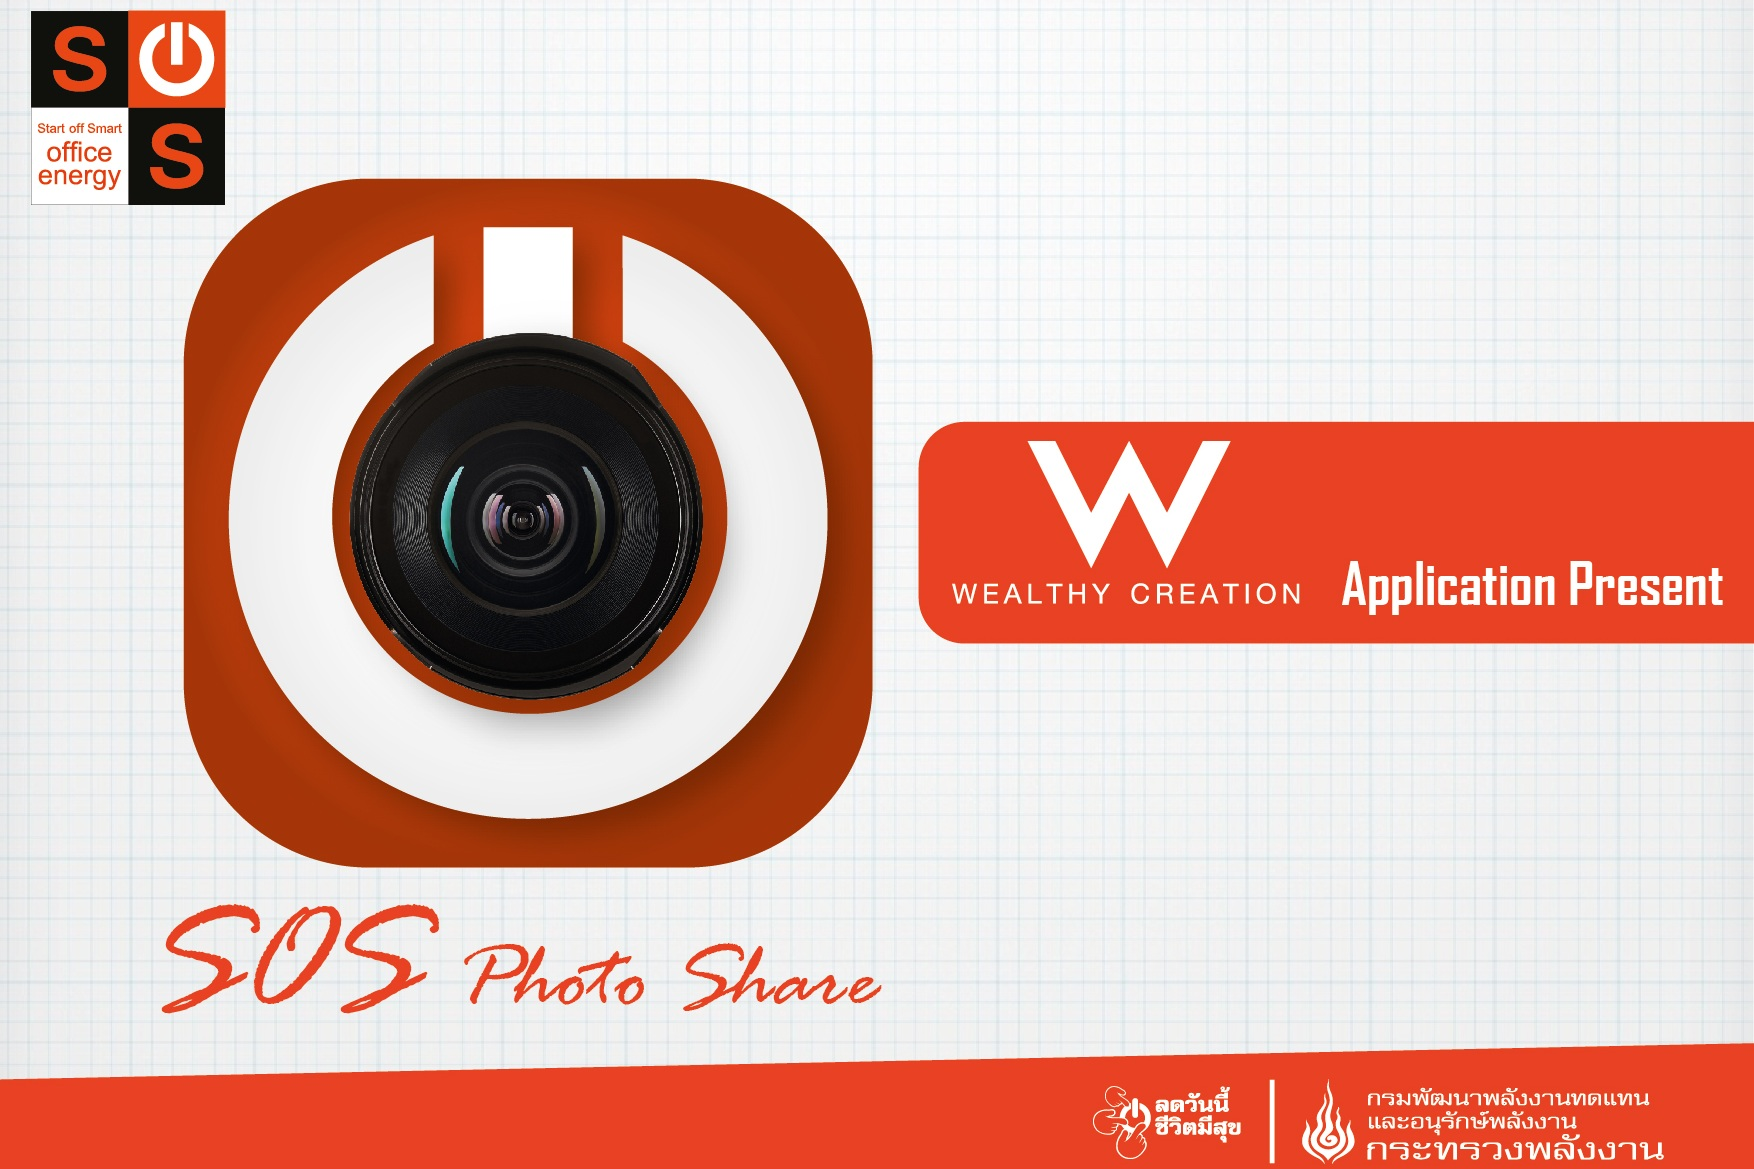 App+Present-01.jpg